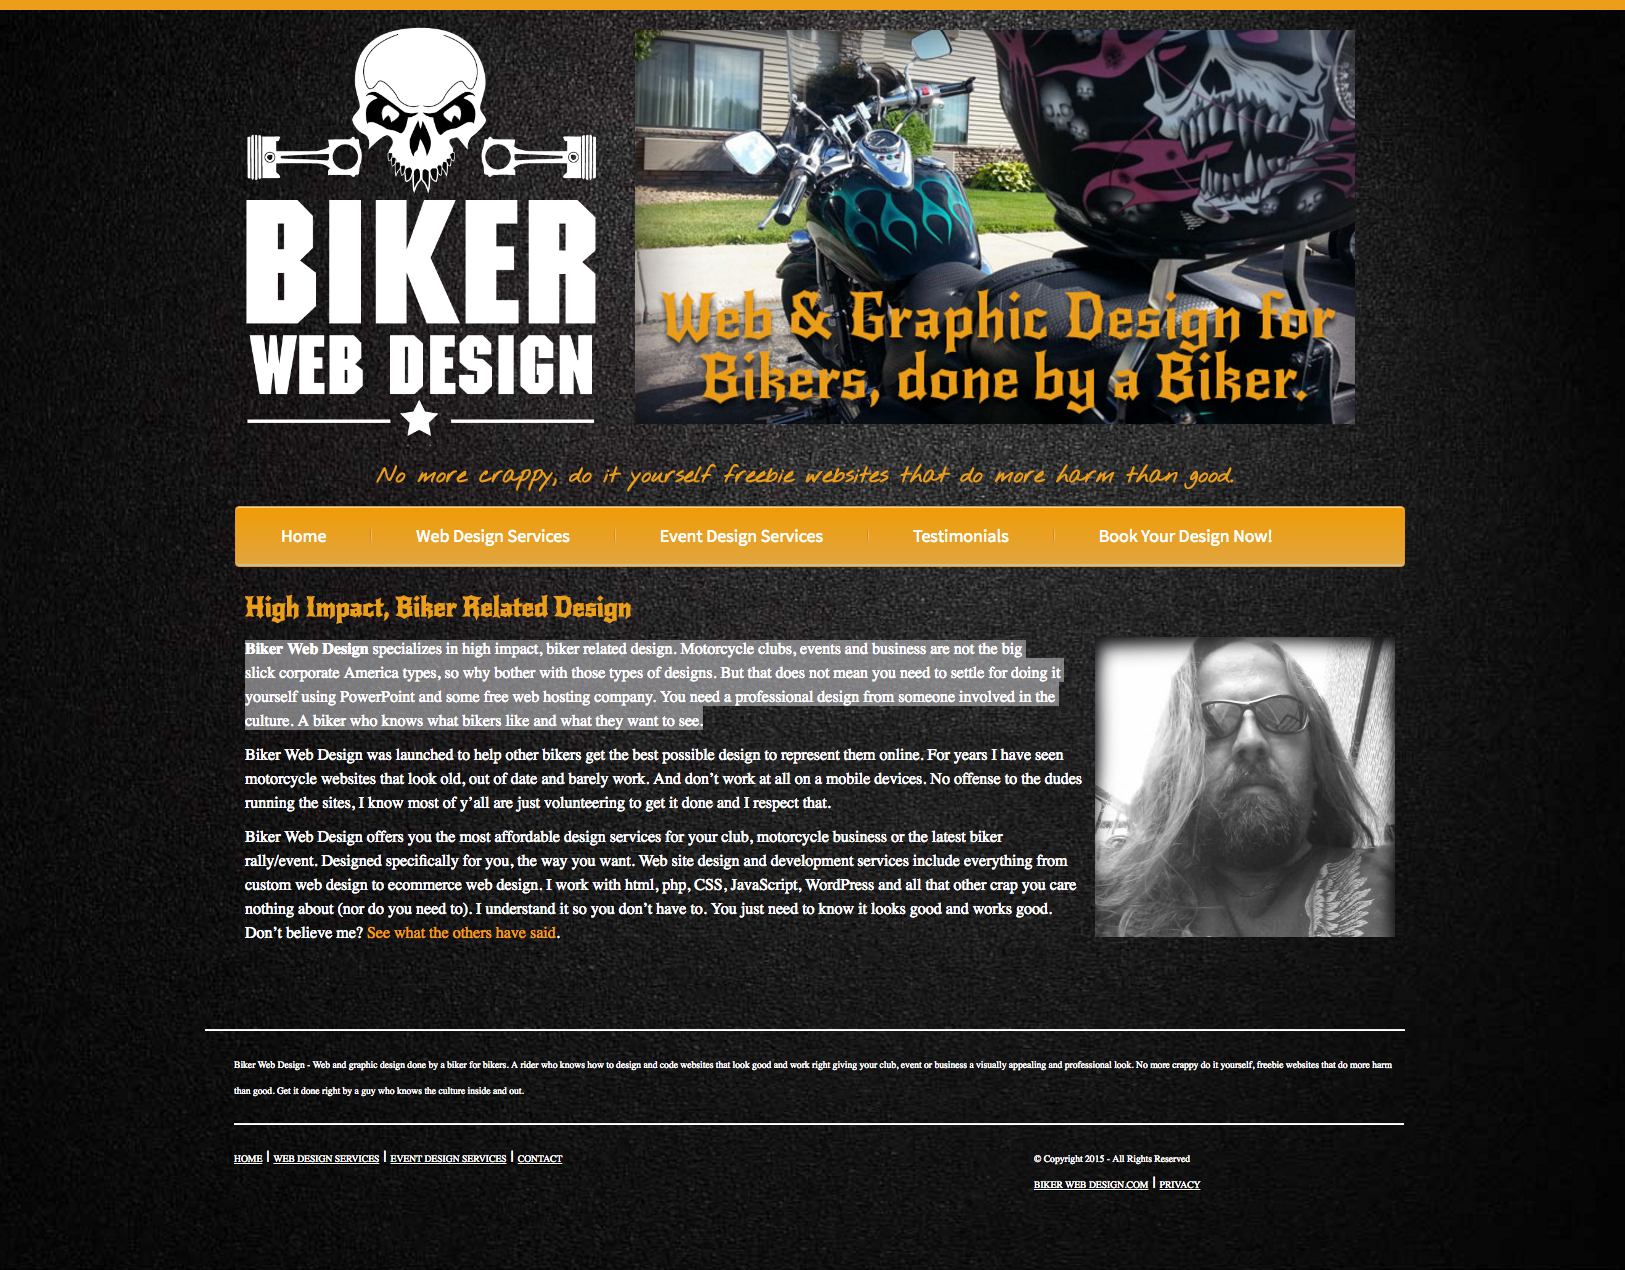 Biker web design creative compulsions screen shot 2016 05 18 at 21029 pm solutioingenieria Image collections